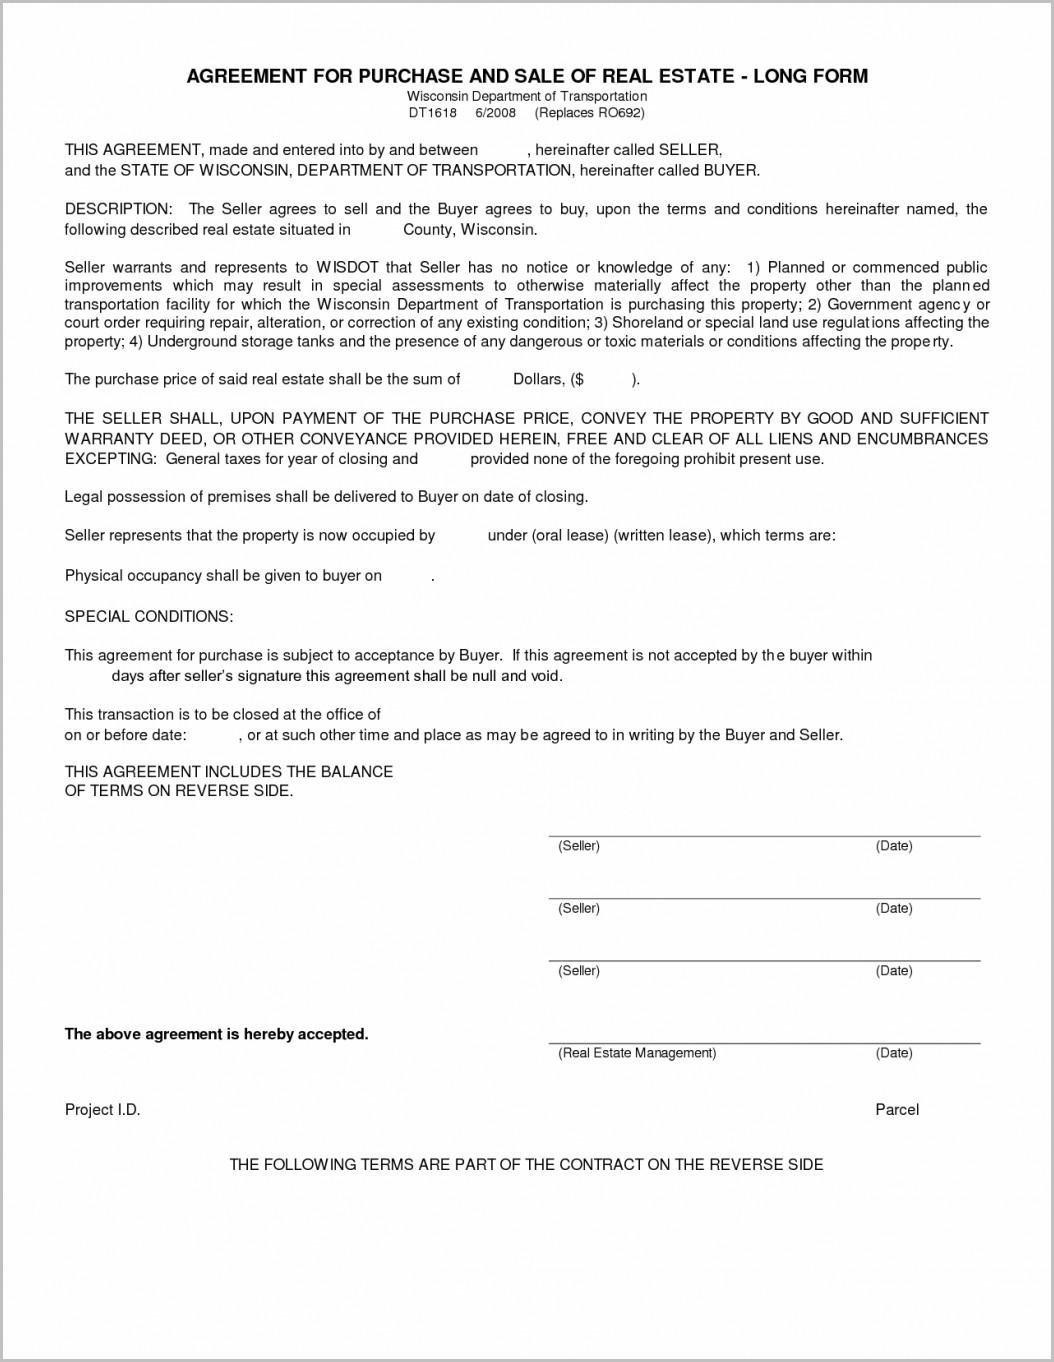 Grant Deed Form Illinois